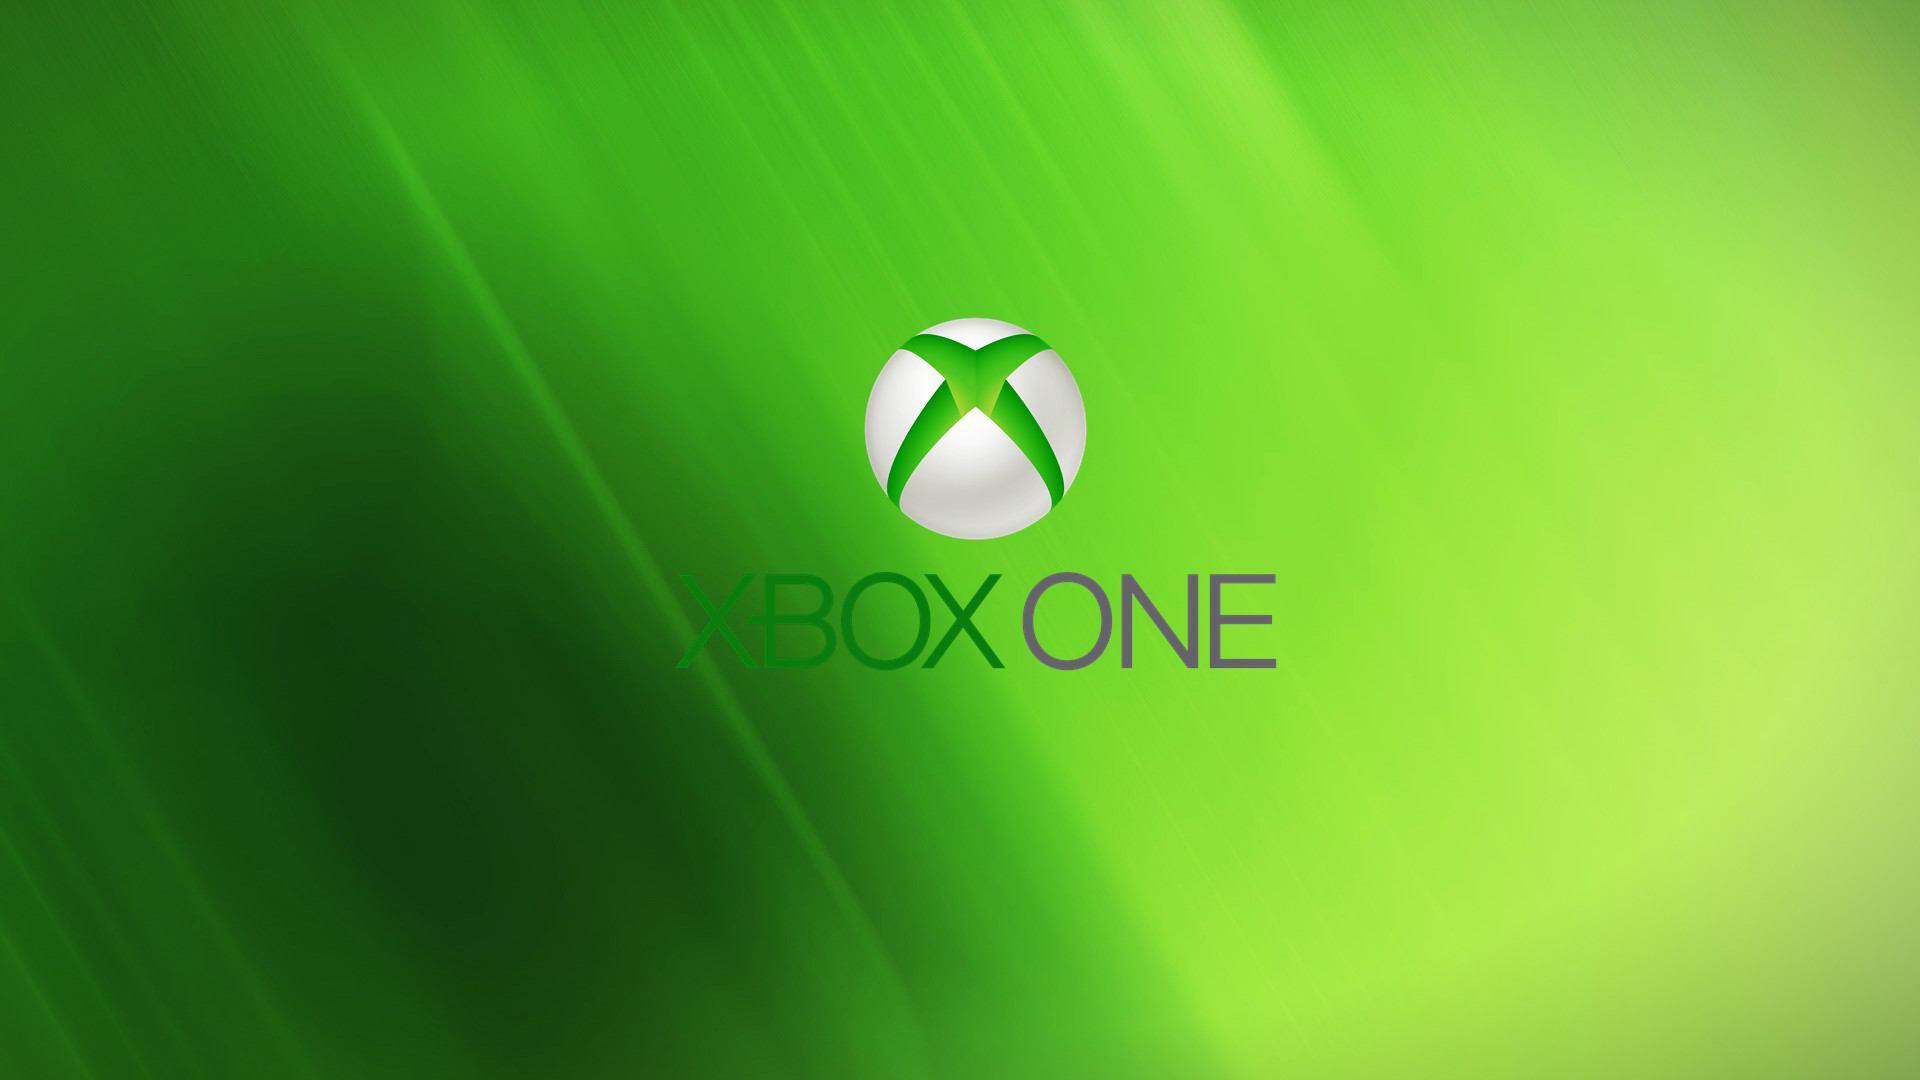 Xbox Logo Wallpaper 73 Images